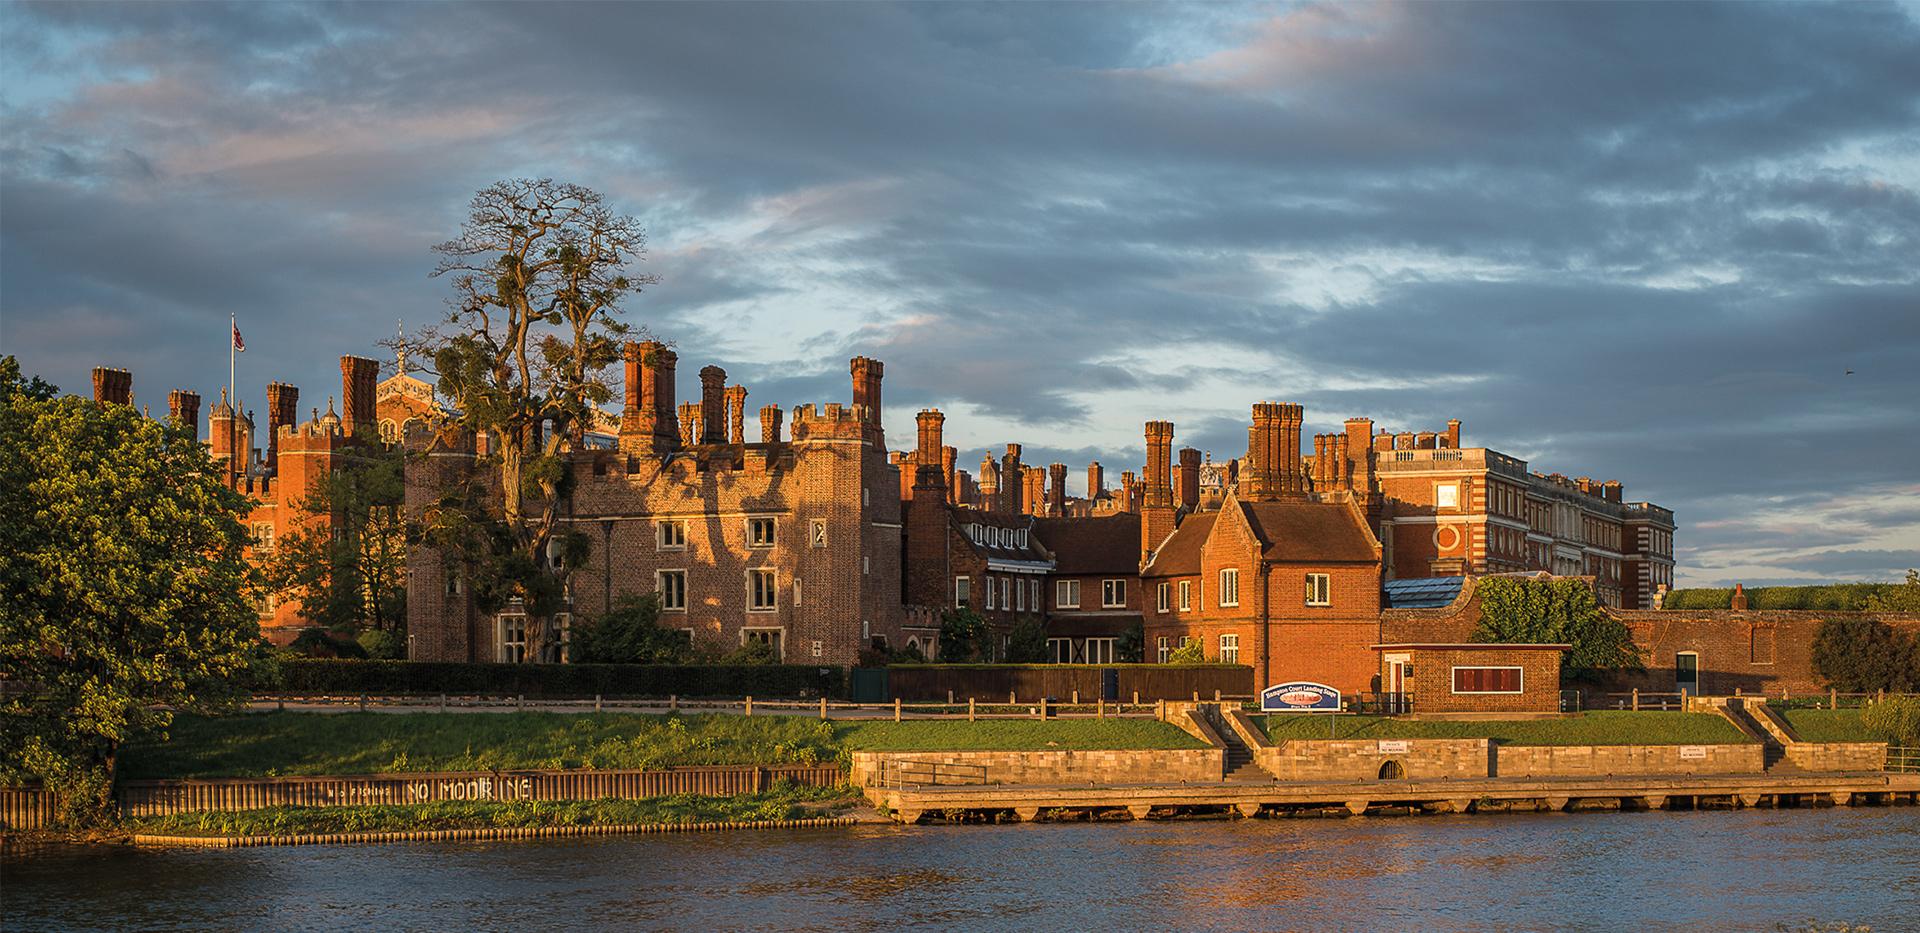 St James, Fitzroy Gate, Hampton court palace